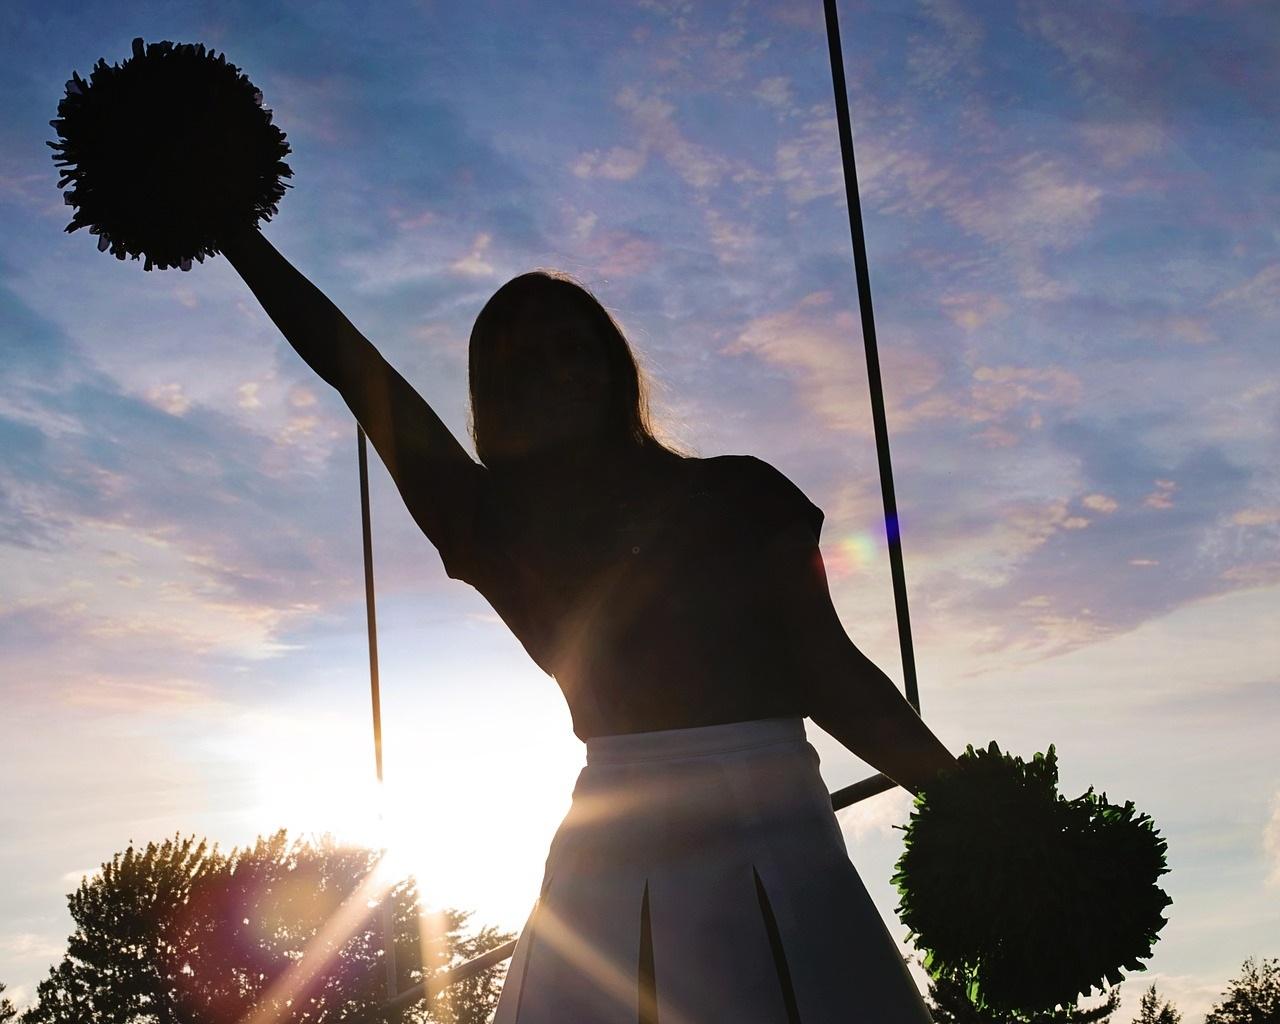 cheerleader-570839_1920.jpg